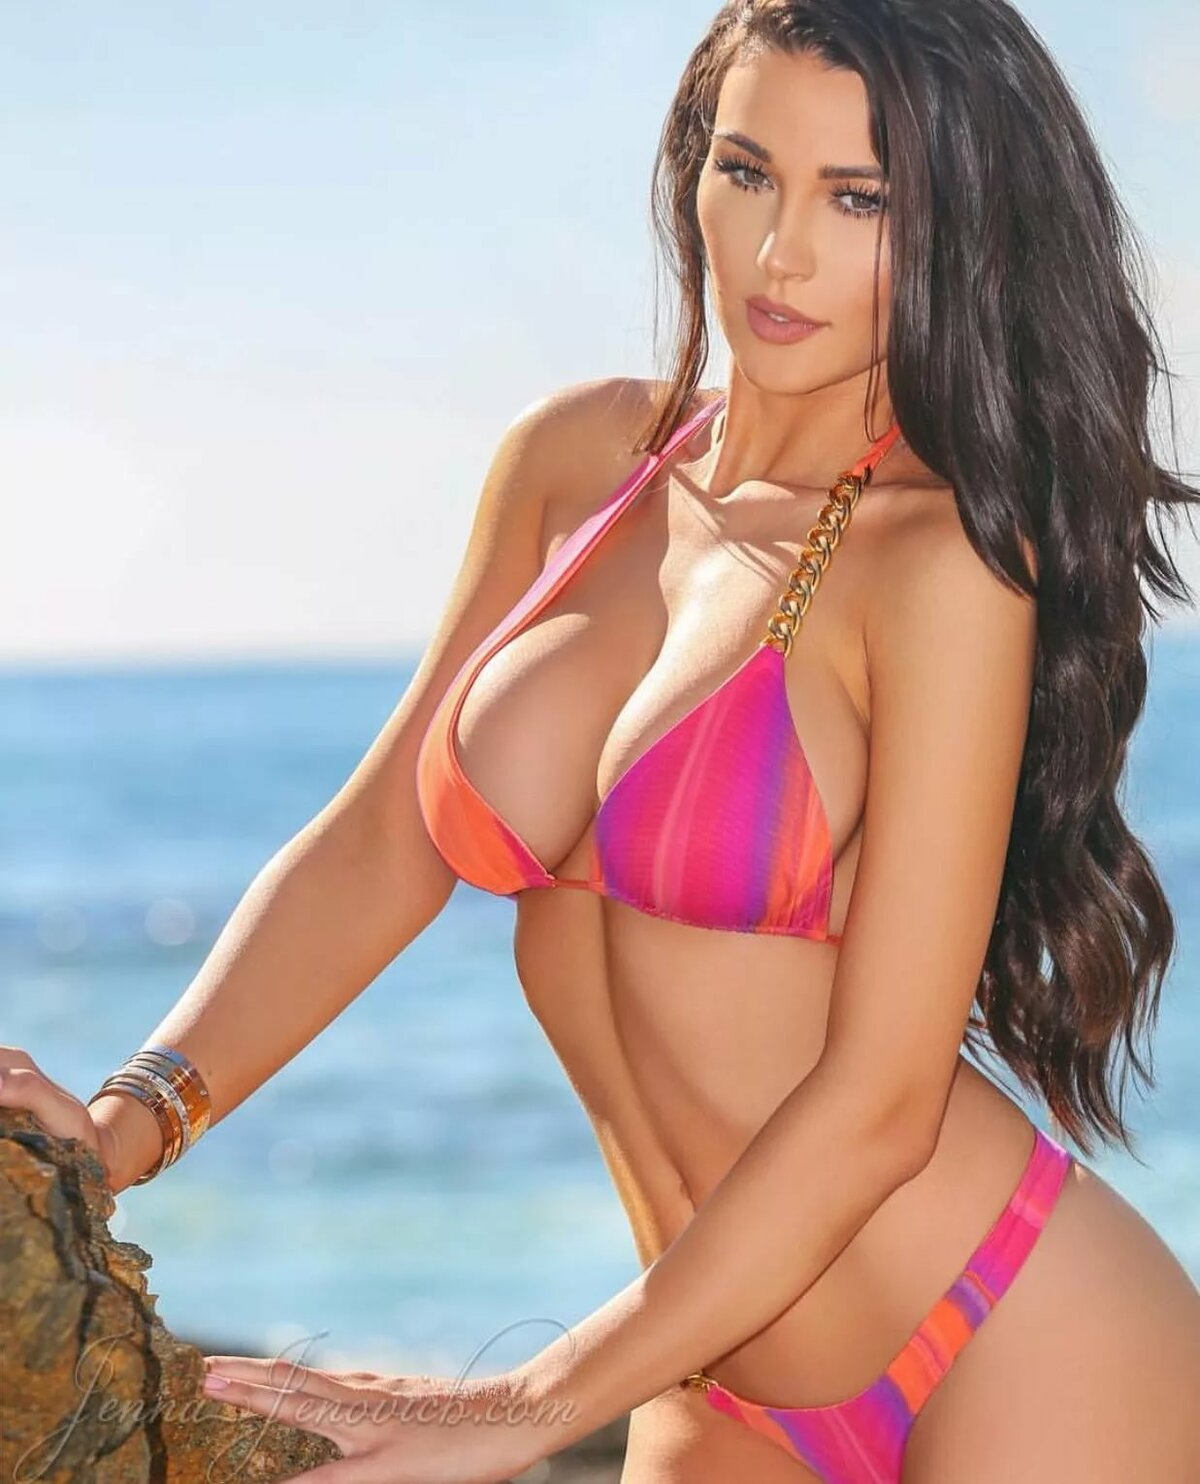 girls-naked-hot-bikini-babes-pics-on-wii-porno-carry-underwood